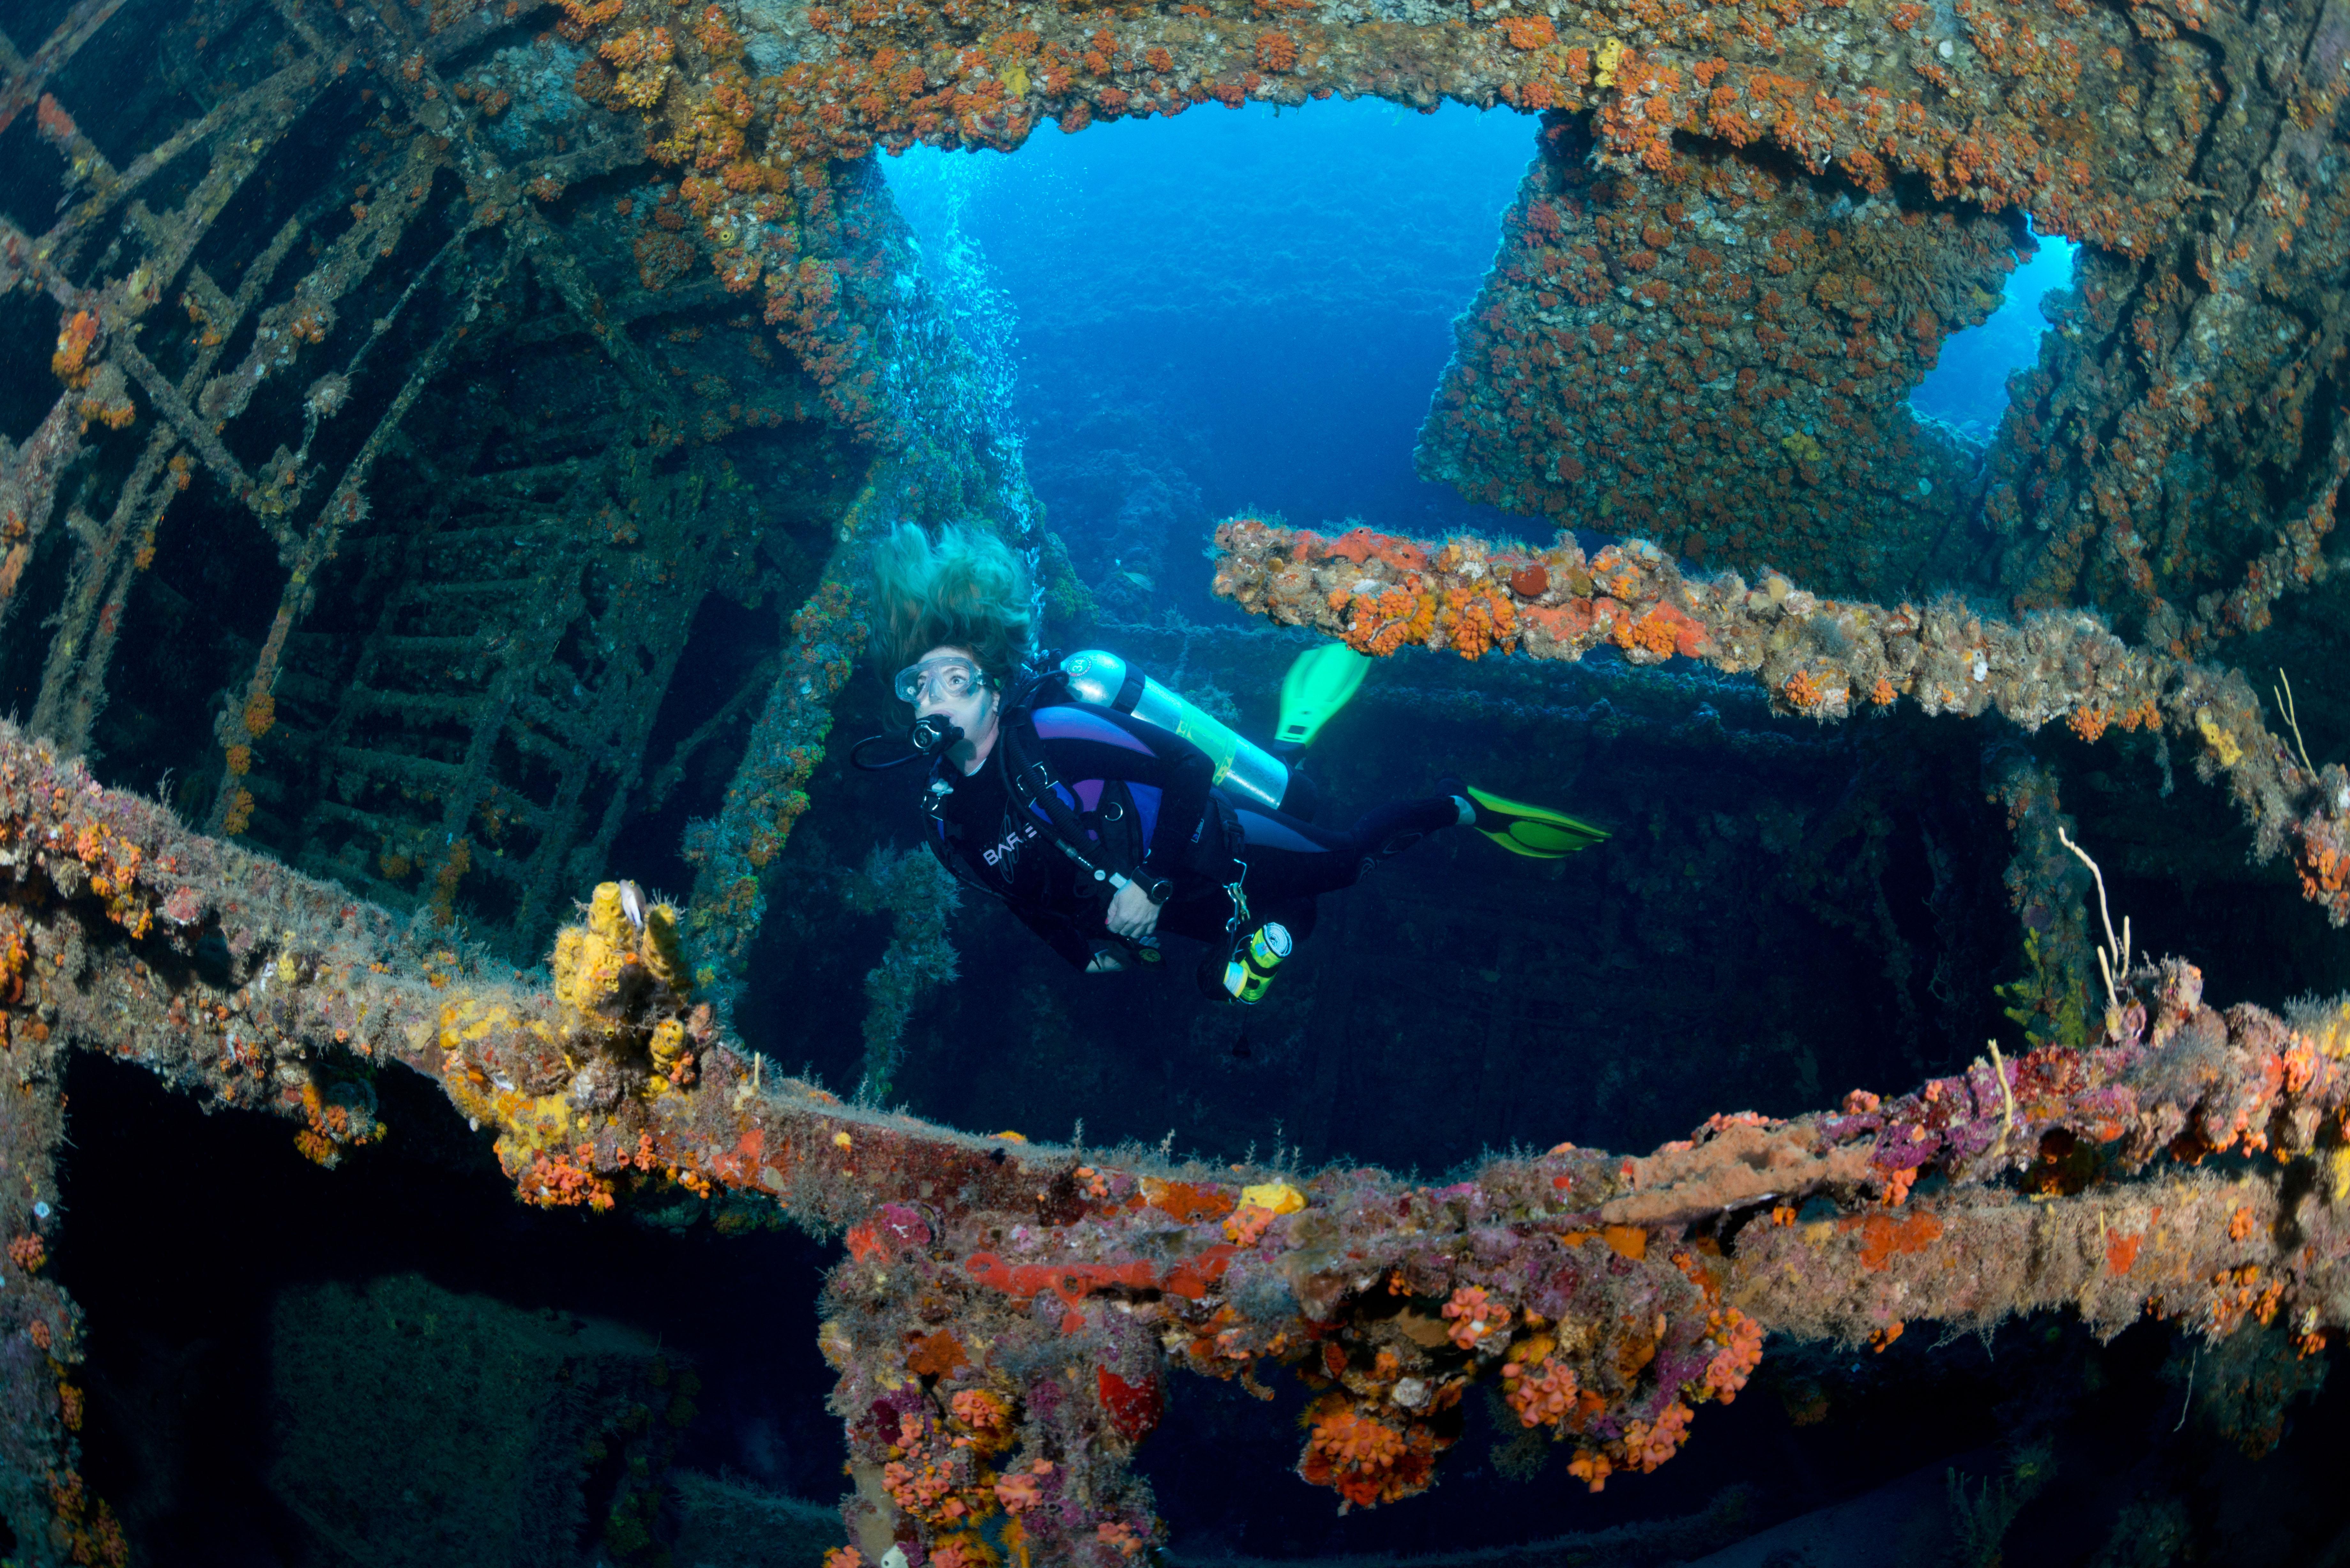 A female scuba diver penetrates a wreck near the coast of Pompano Beach, Florida